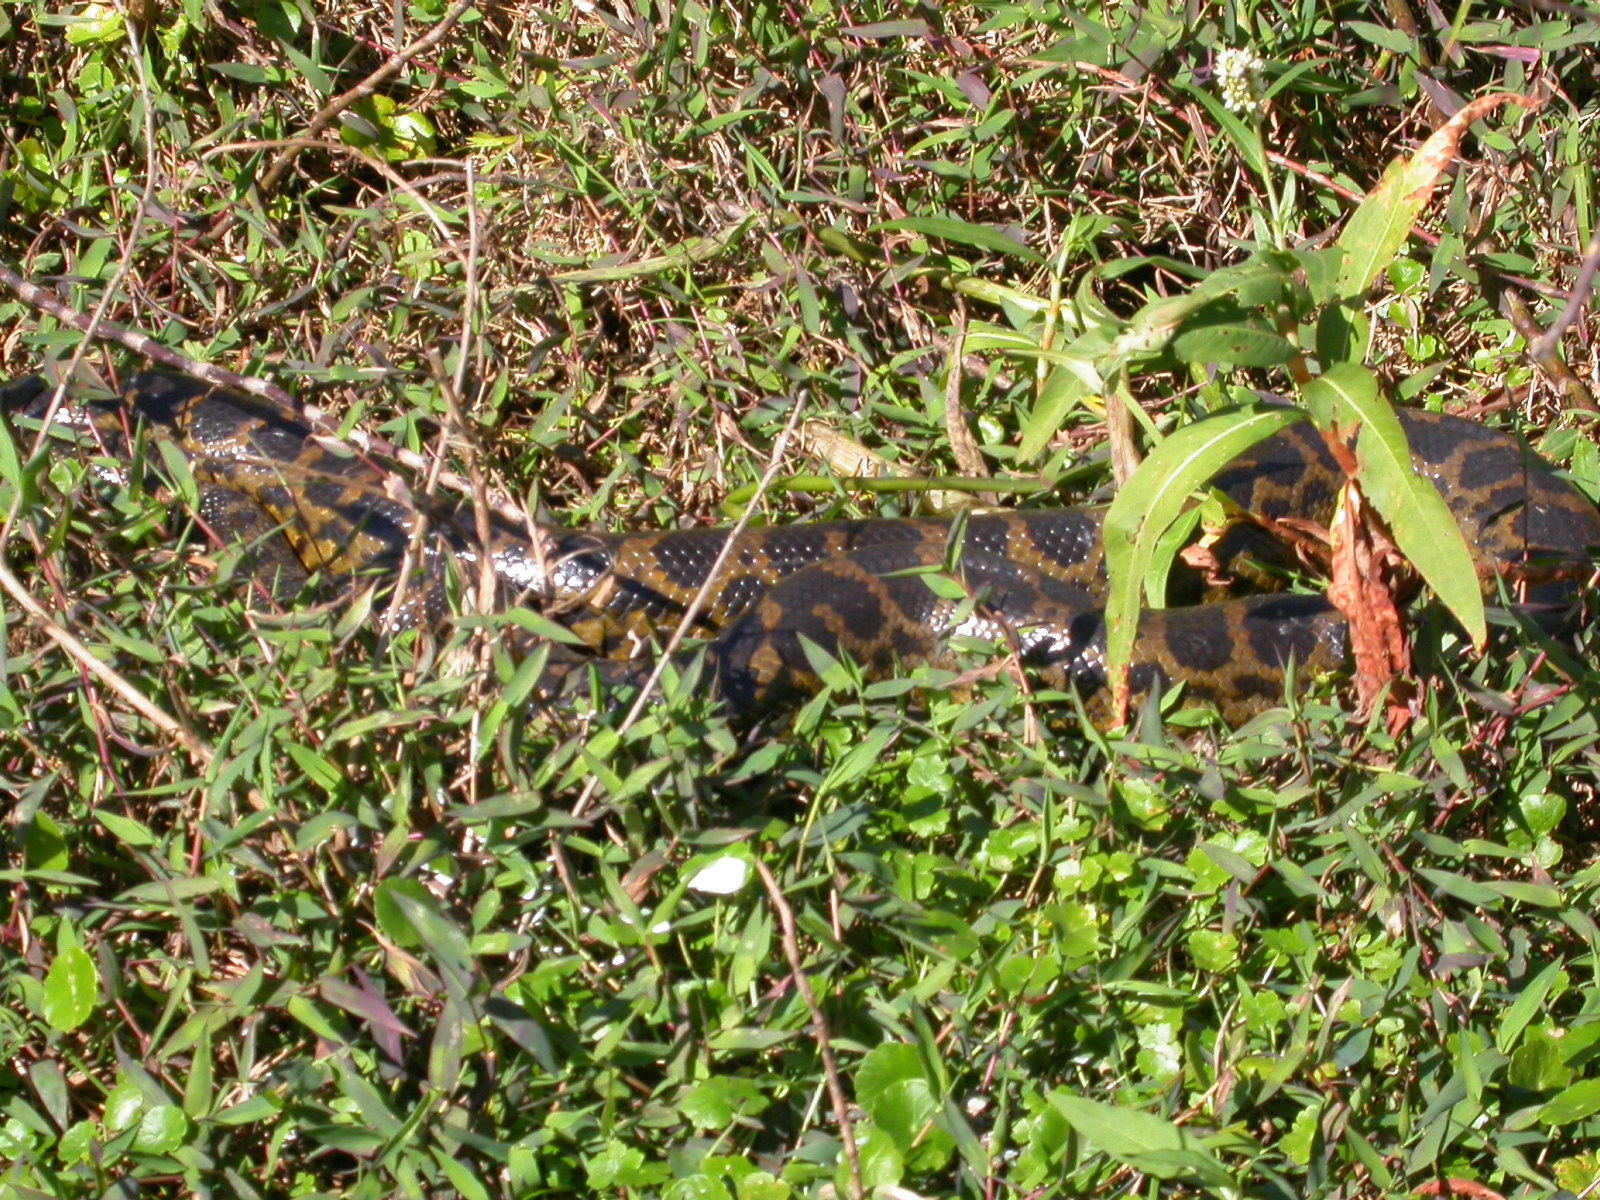 Image of Yellow anaconda